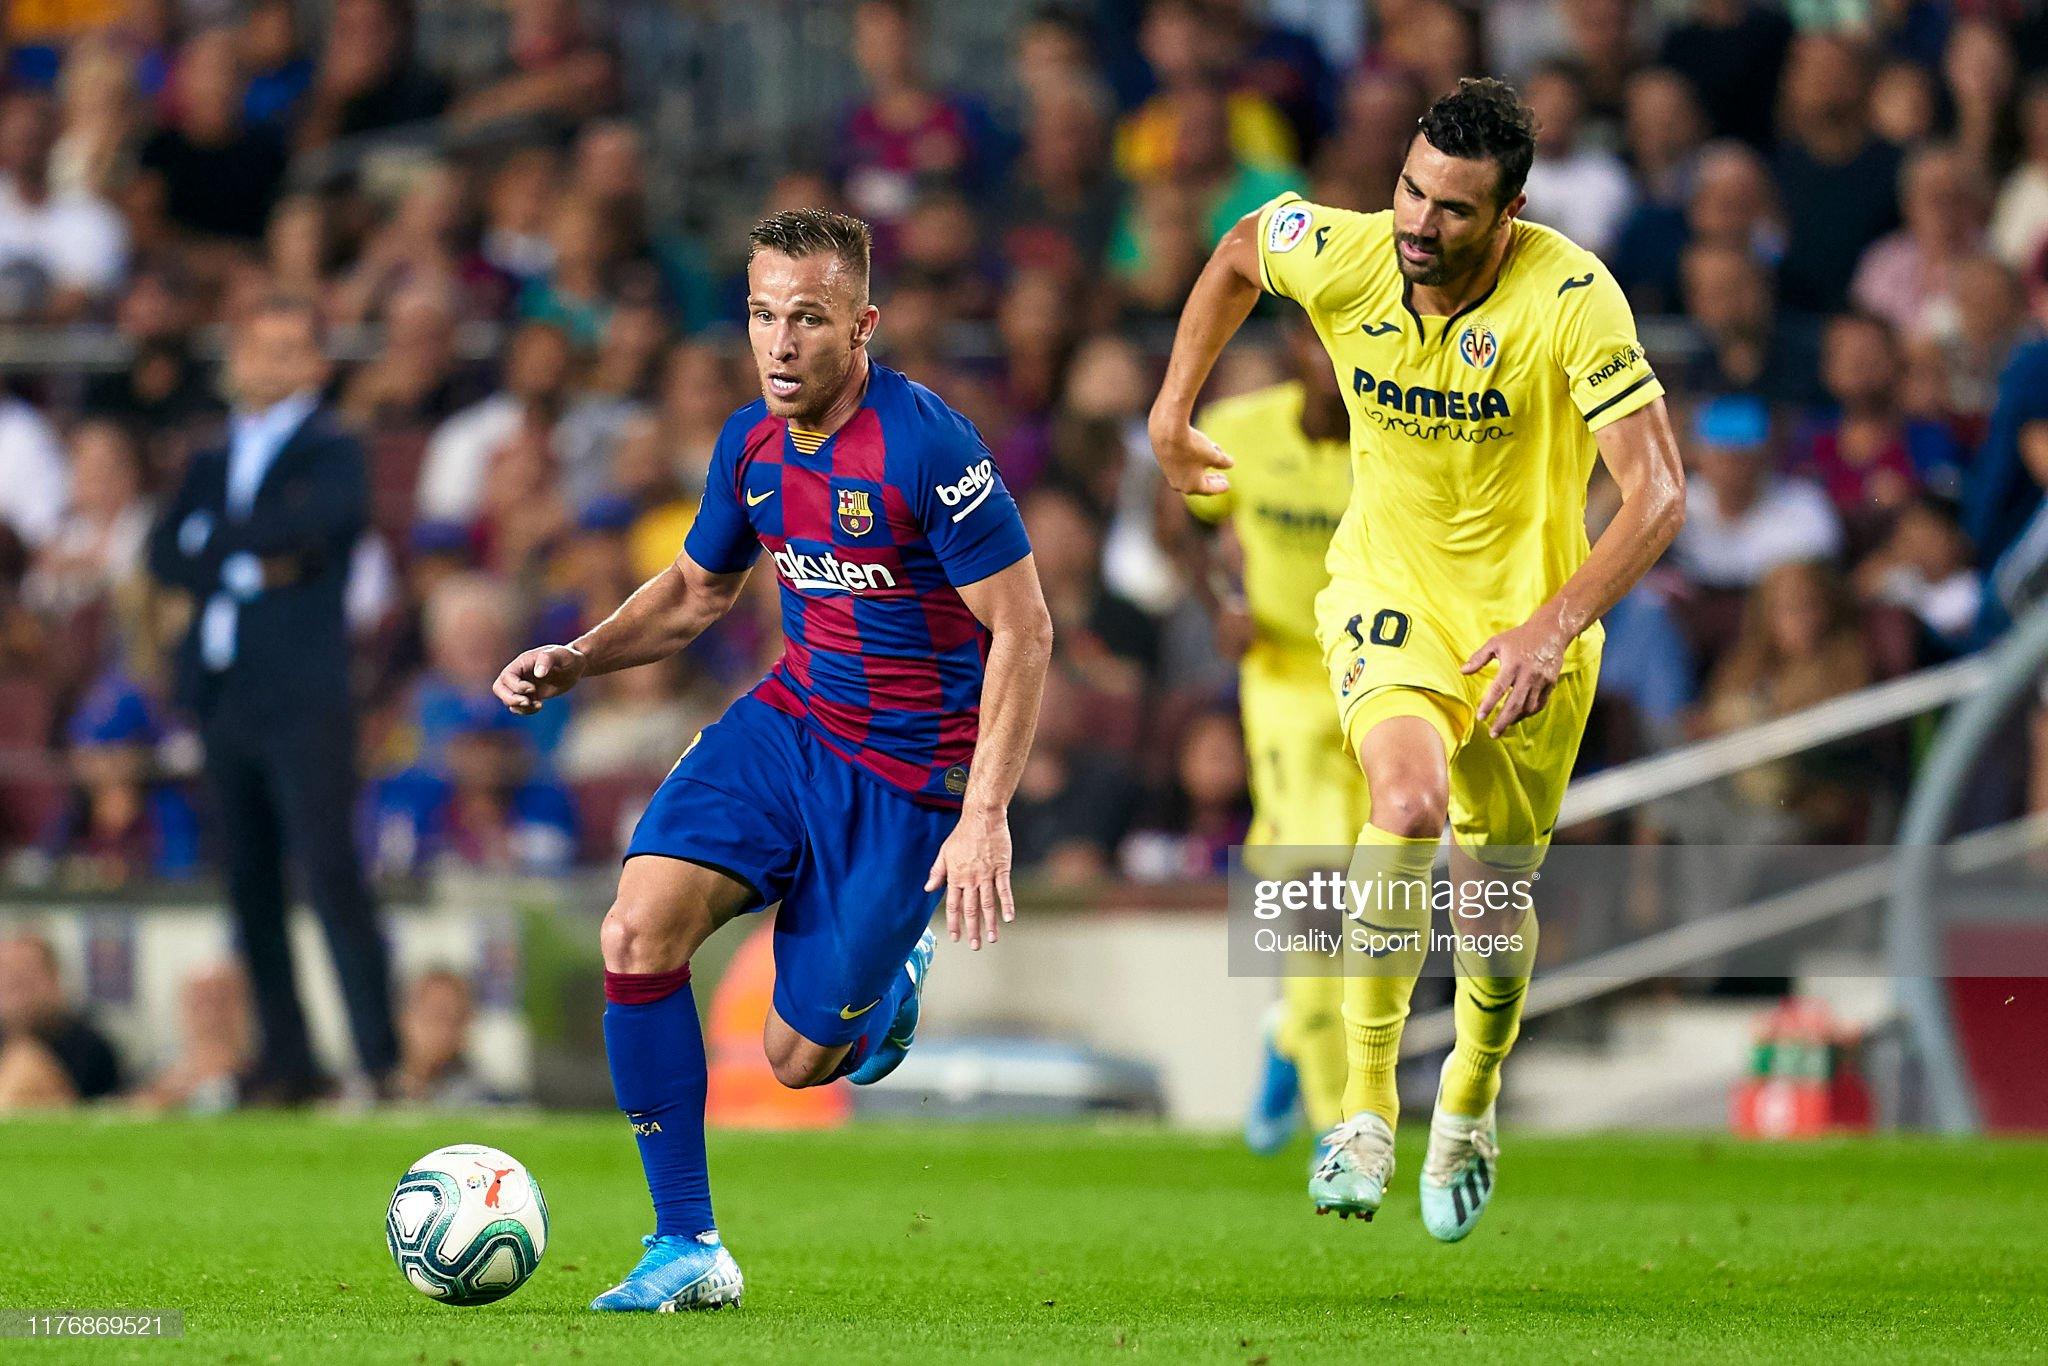 صور مباراة : برشلونة - فياريال 2-1 ( 24-09-2019 )  Arthur-of-fc-barcelona-competes-for-the-ball-with-vicente-iborra-of-picture-id1176869521?s=2048x2048